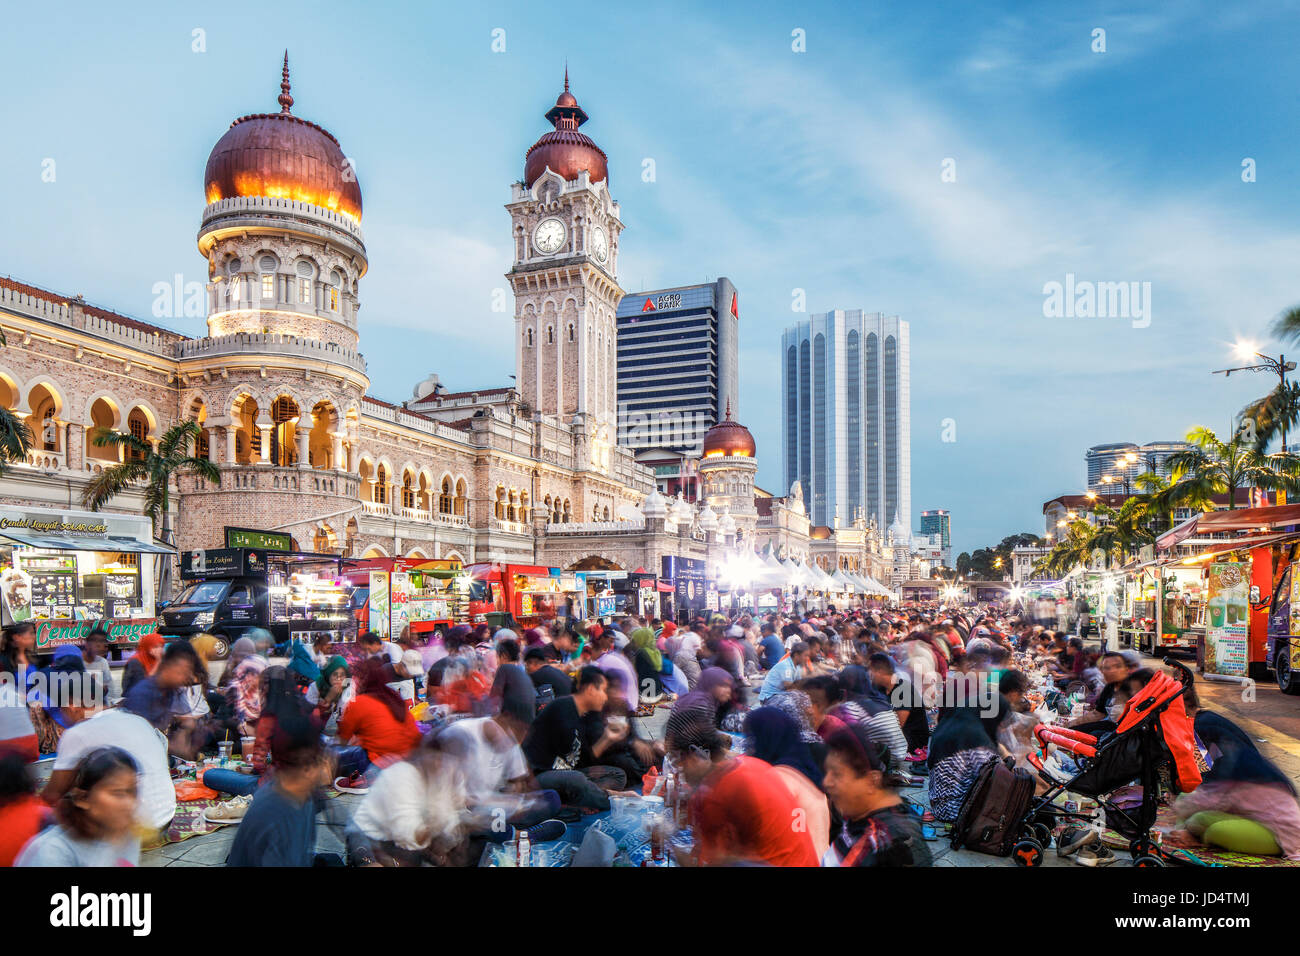 La massa la rottura del digiuno del mese di syawal in piazza Merdeka, Kuala Lumpur. Immagini Stock